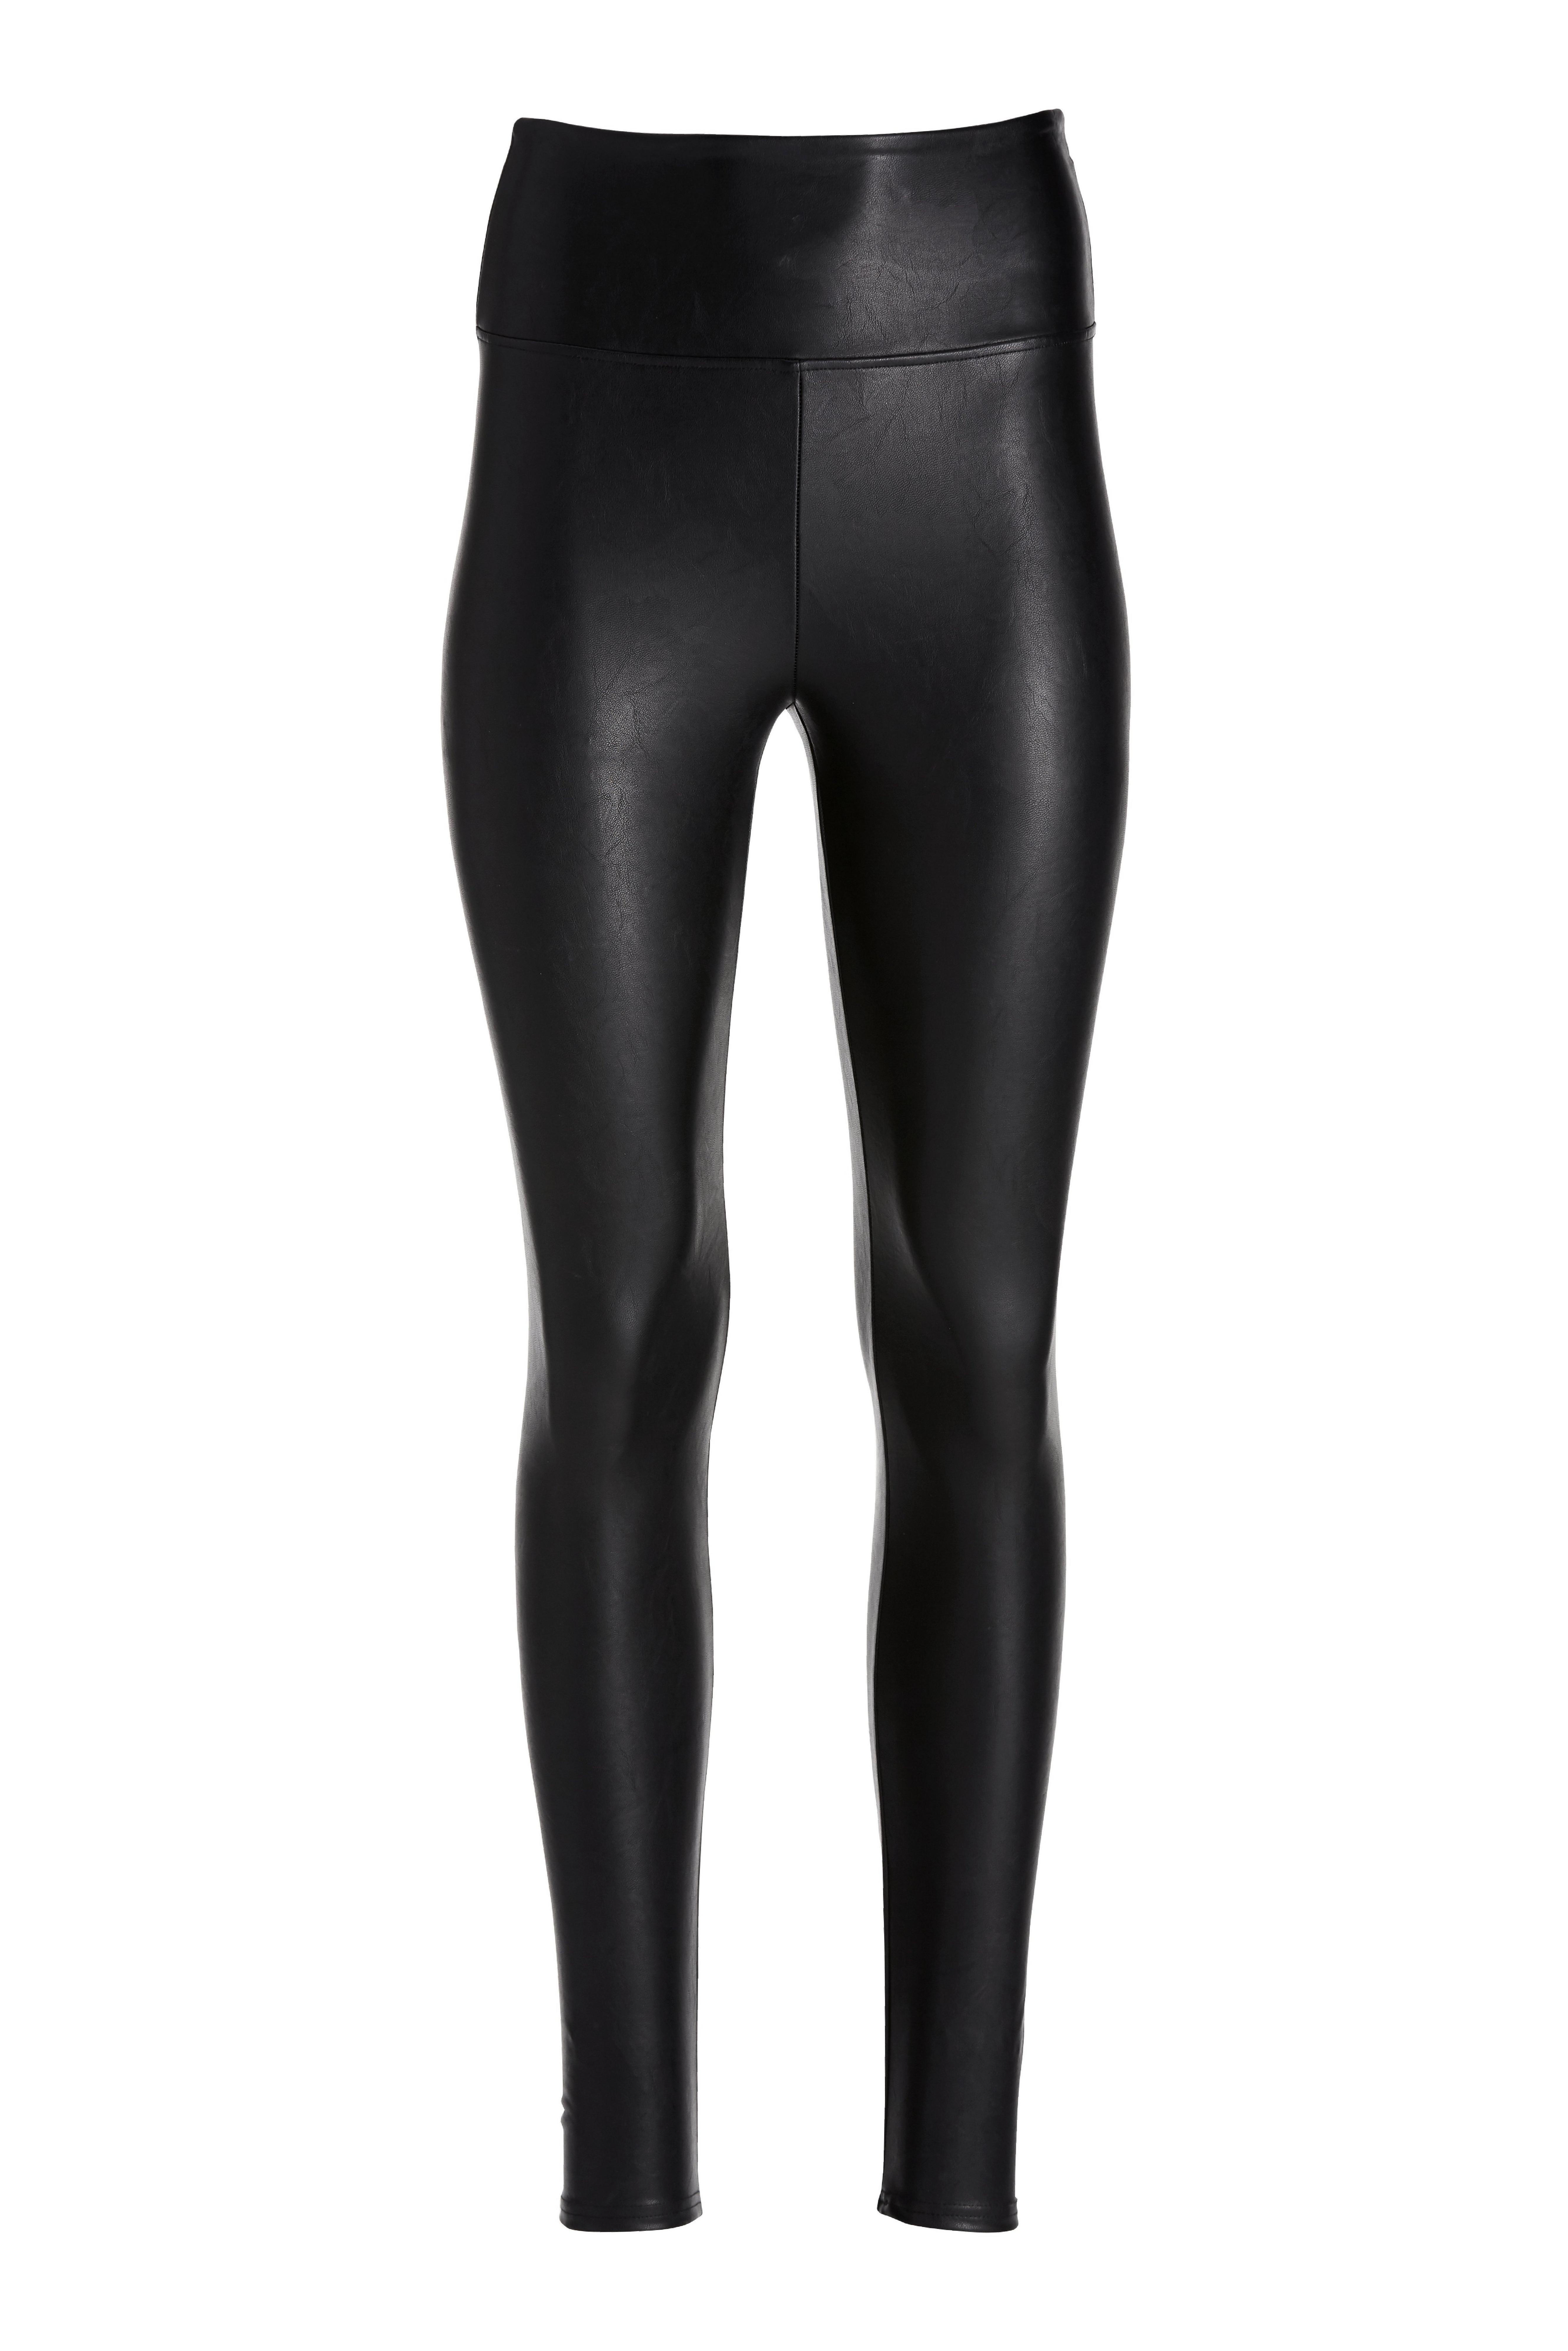 black faux leather leggings.